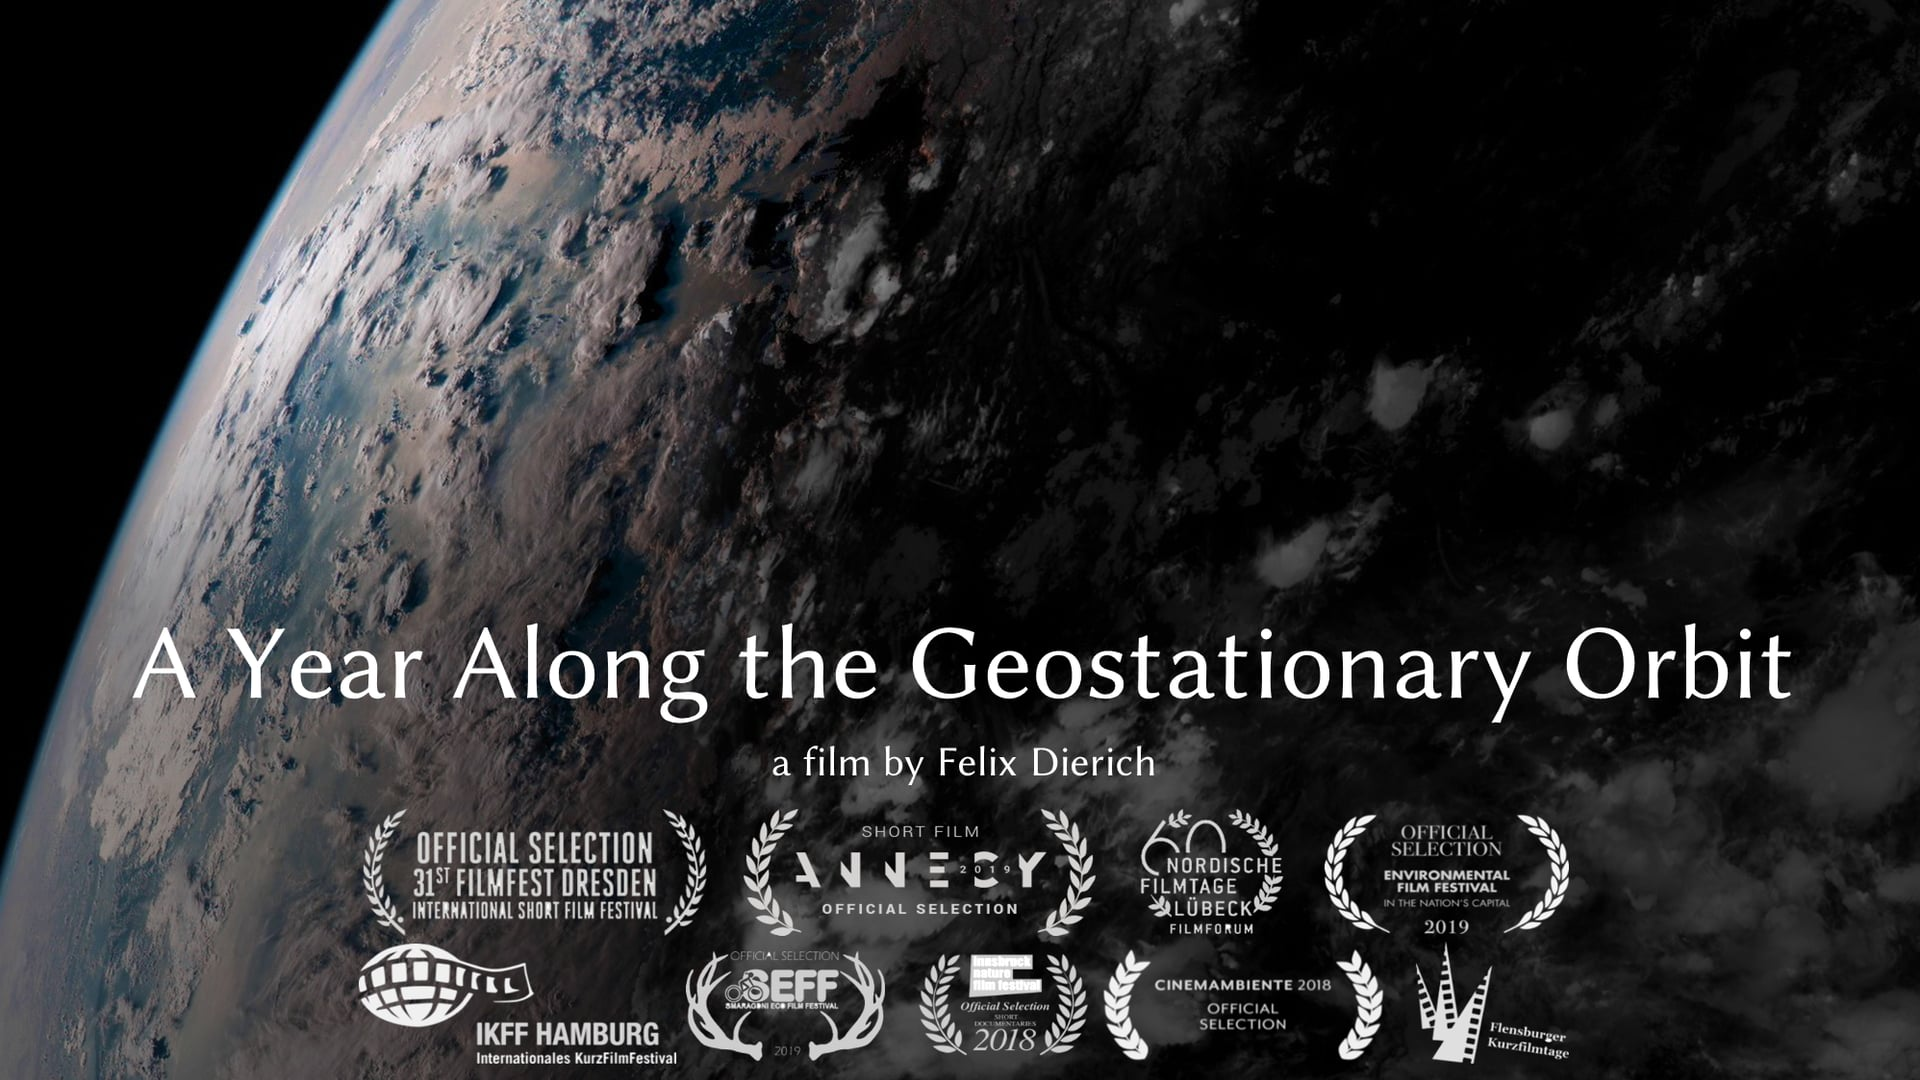 A Year Along the Geostationary Orbit